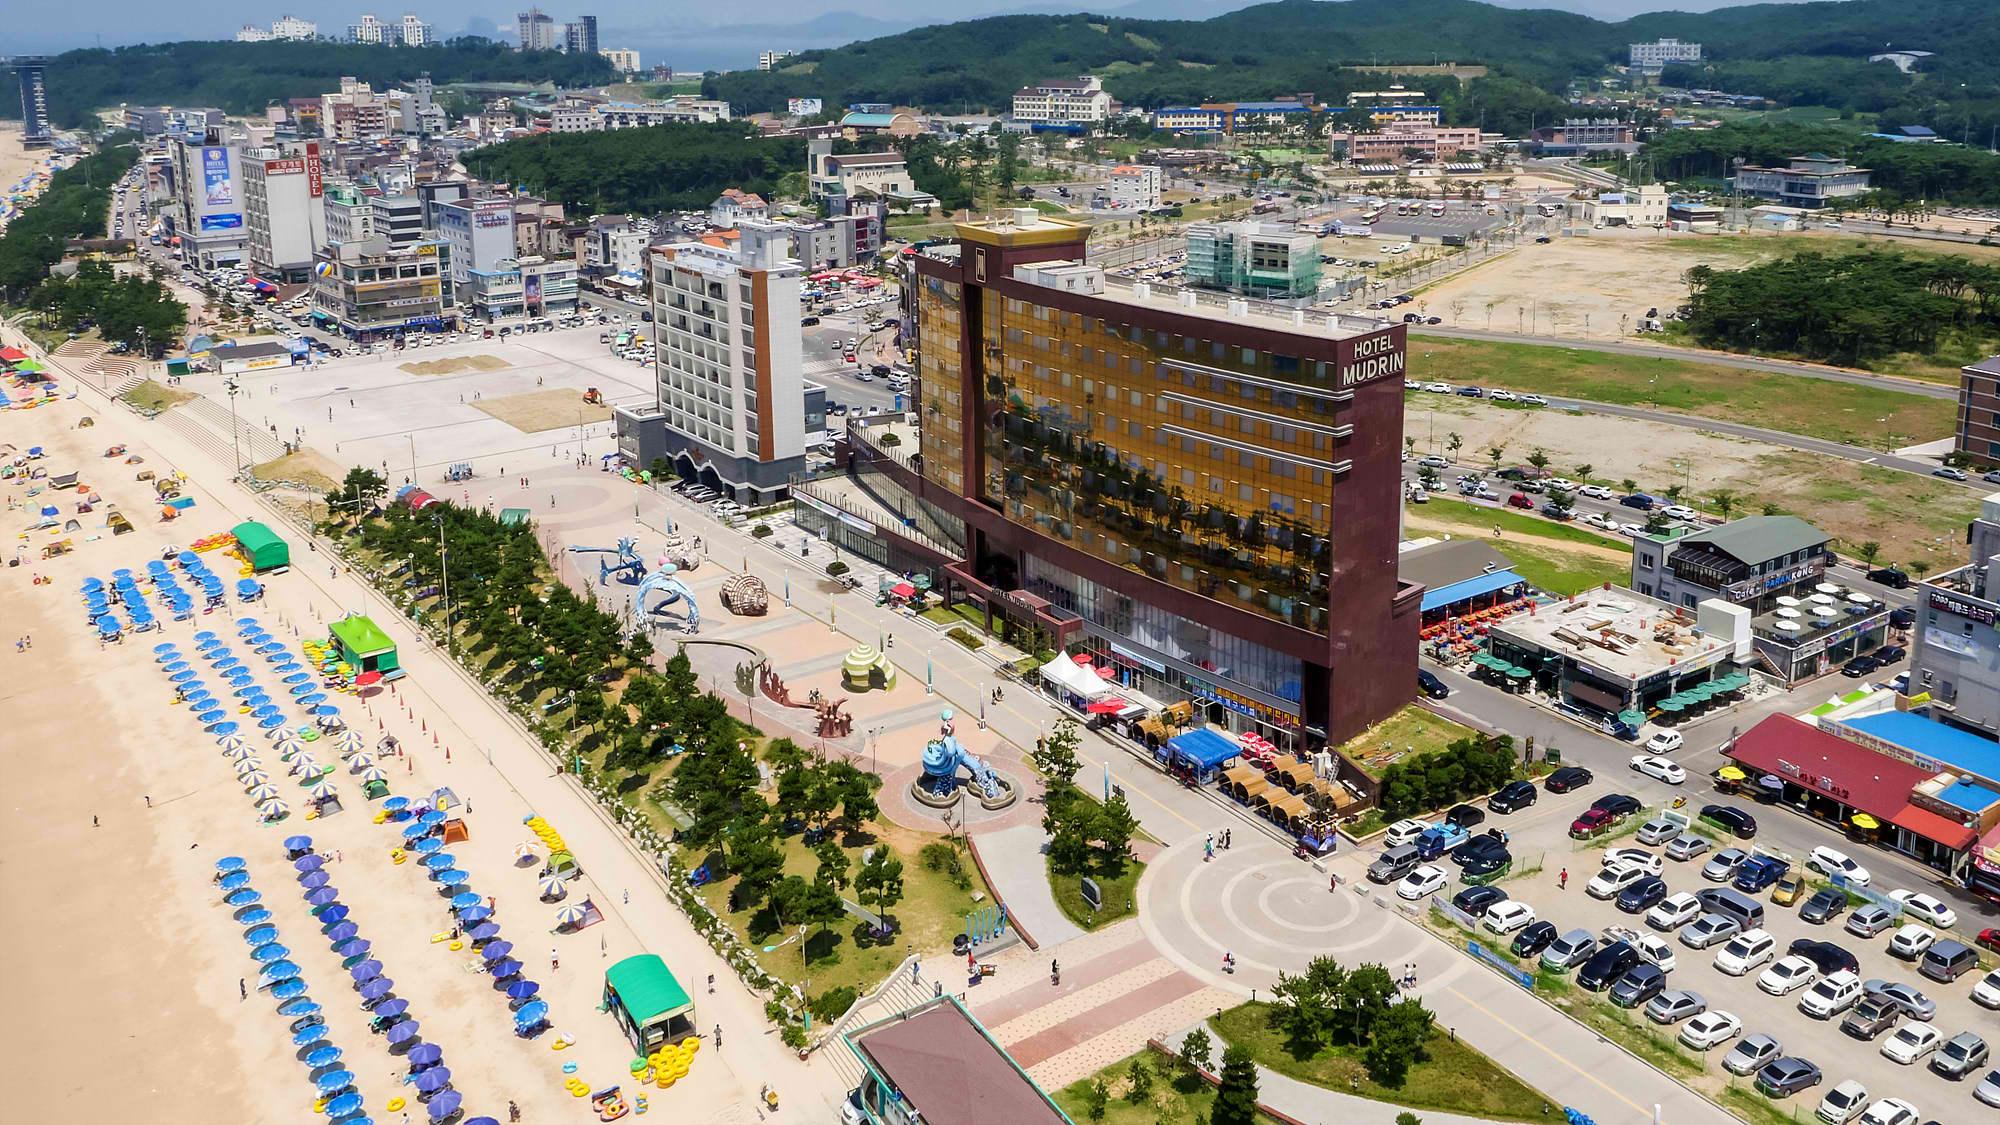 Daecheon beach. Image credit:  Boryeong Mud Festival